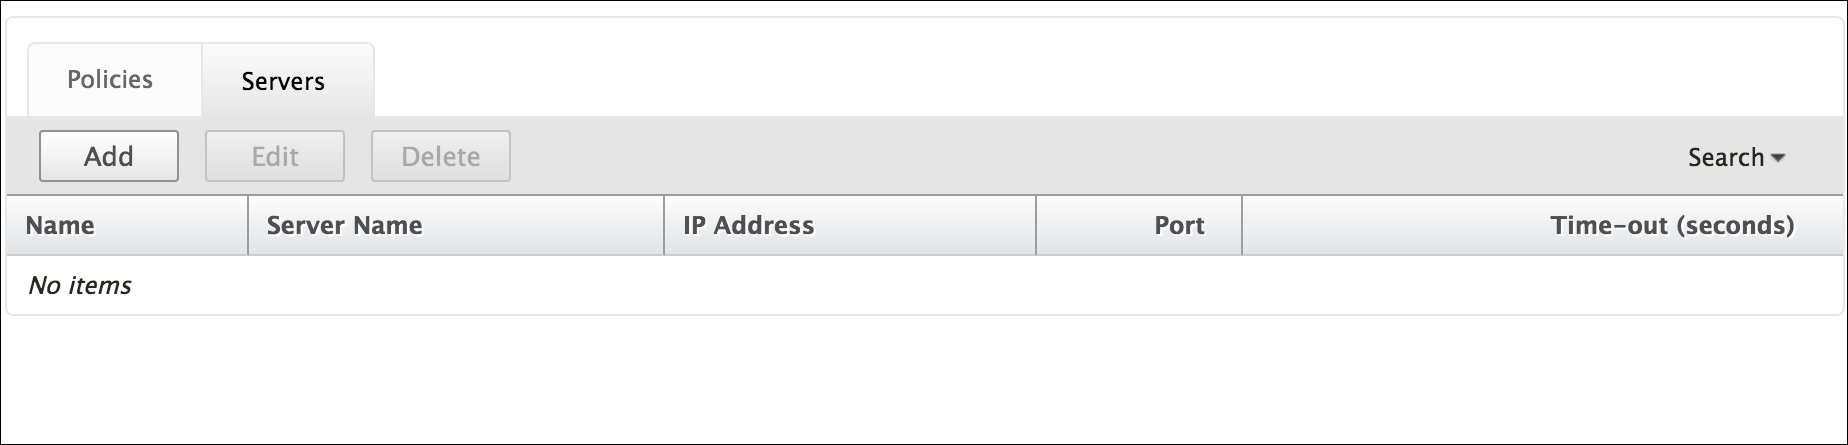 How to Configure NetScaler Gateway to use RADIUS and LDAP